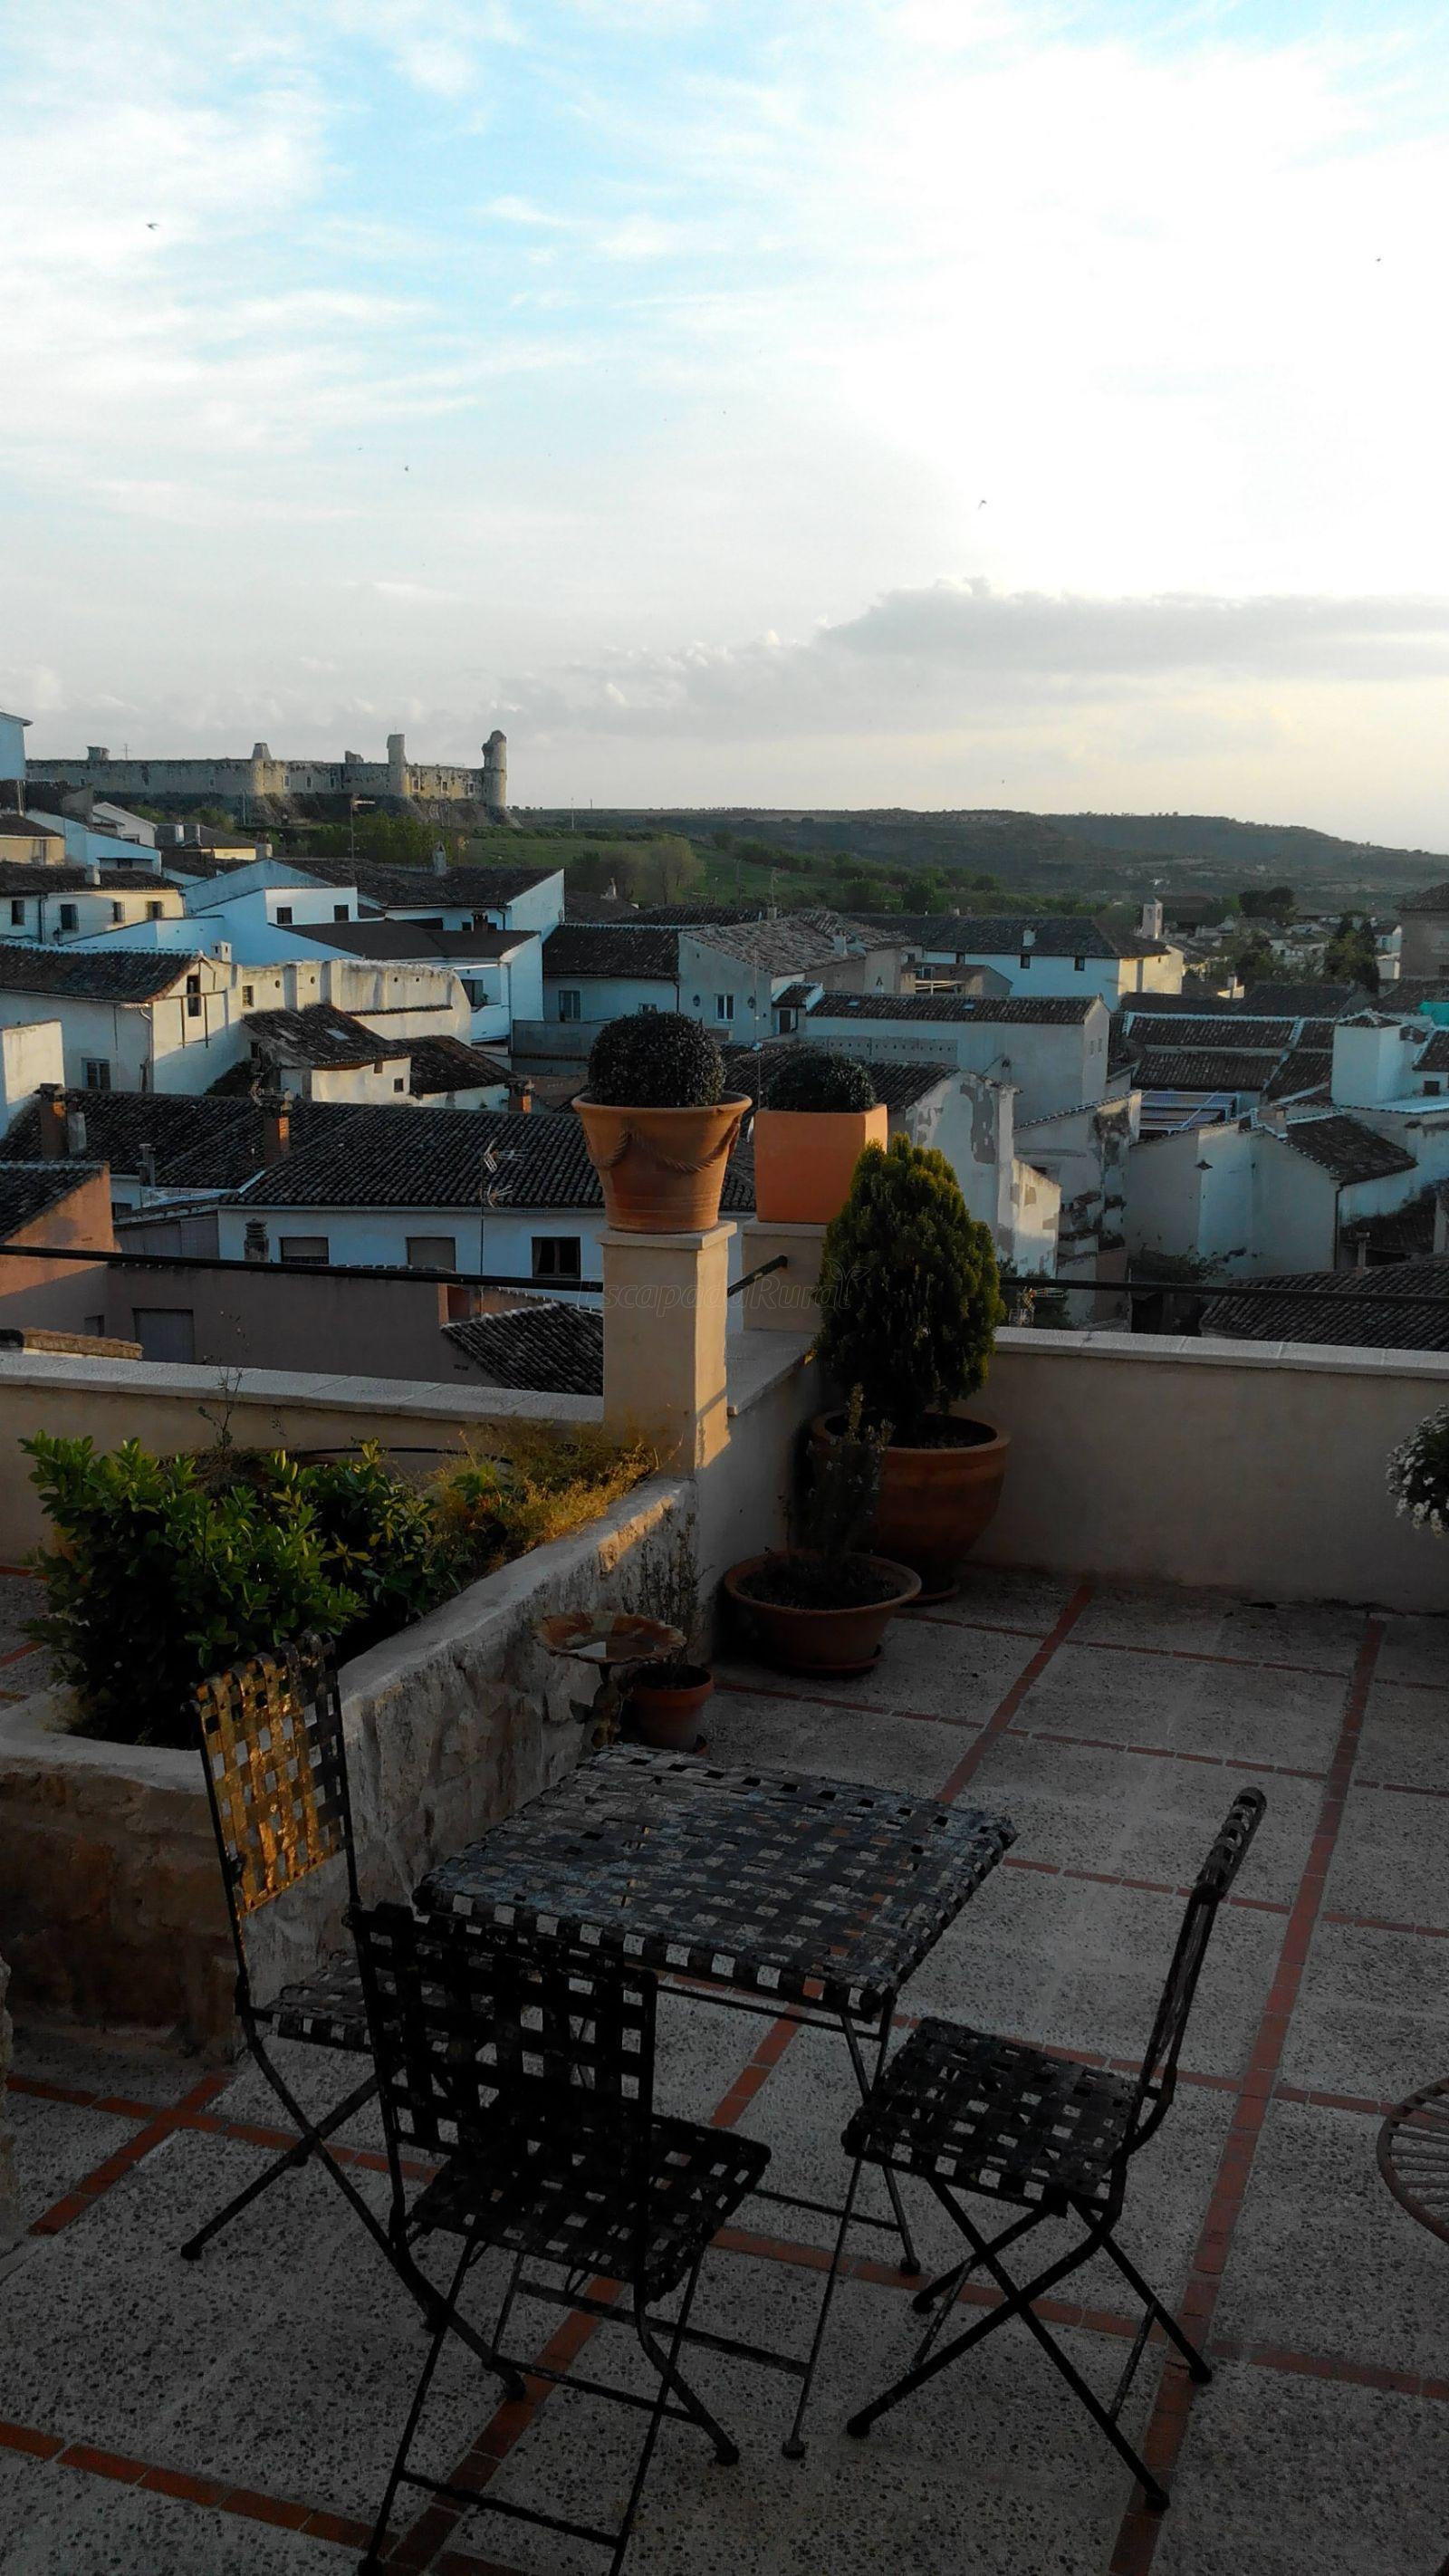 Opiniones sobre casa rural terrazas a la plaza madrid for Casas sobre terrazas